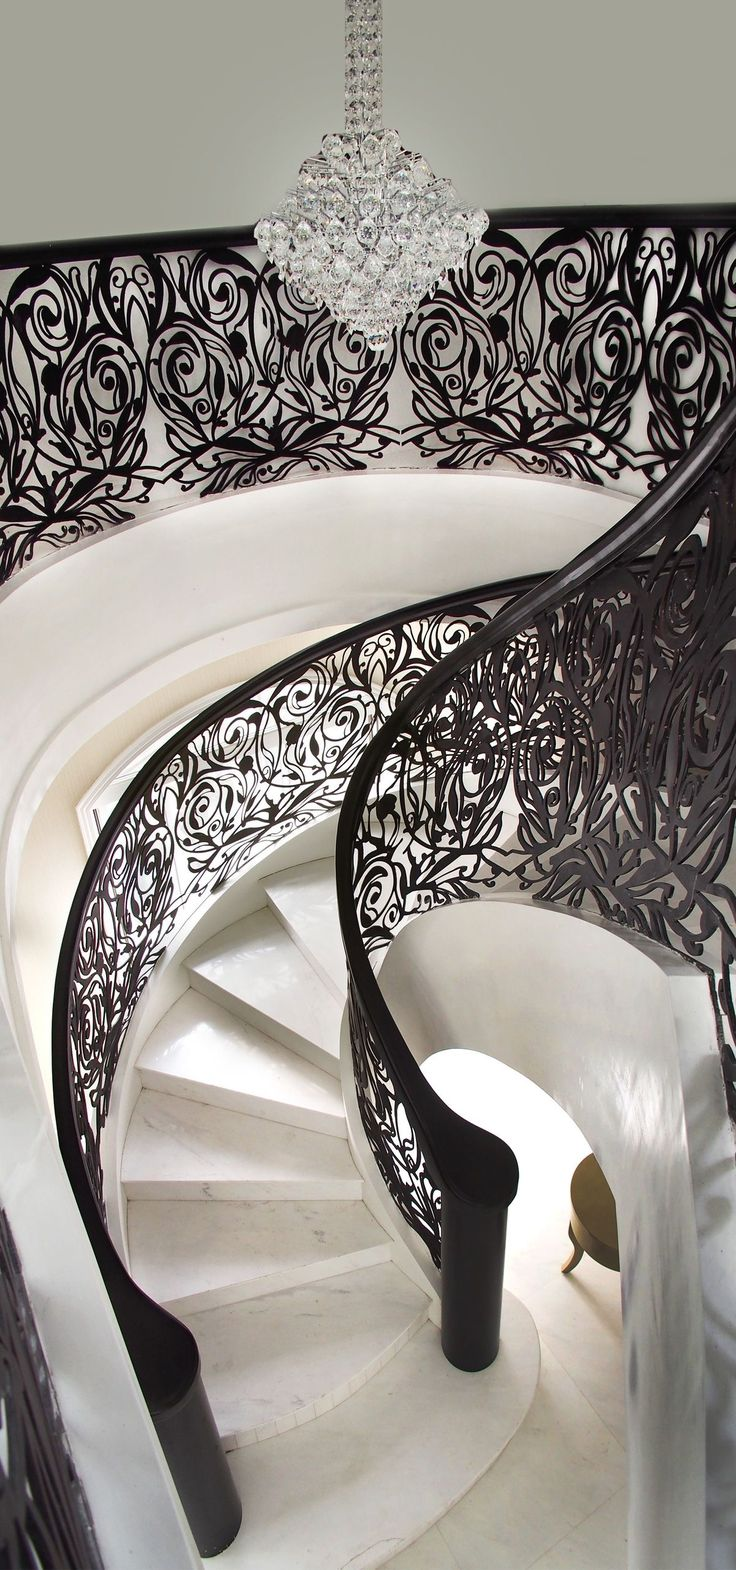 best lijnen images on pinterest groomsmen arquitetura and patterns